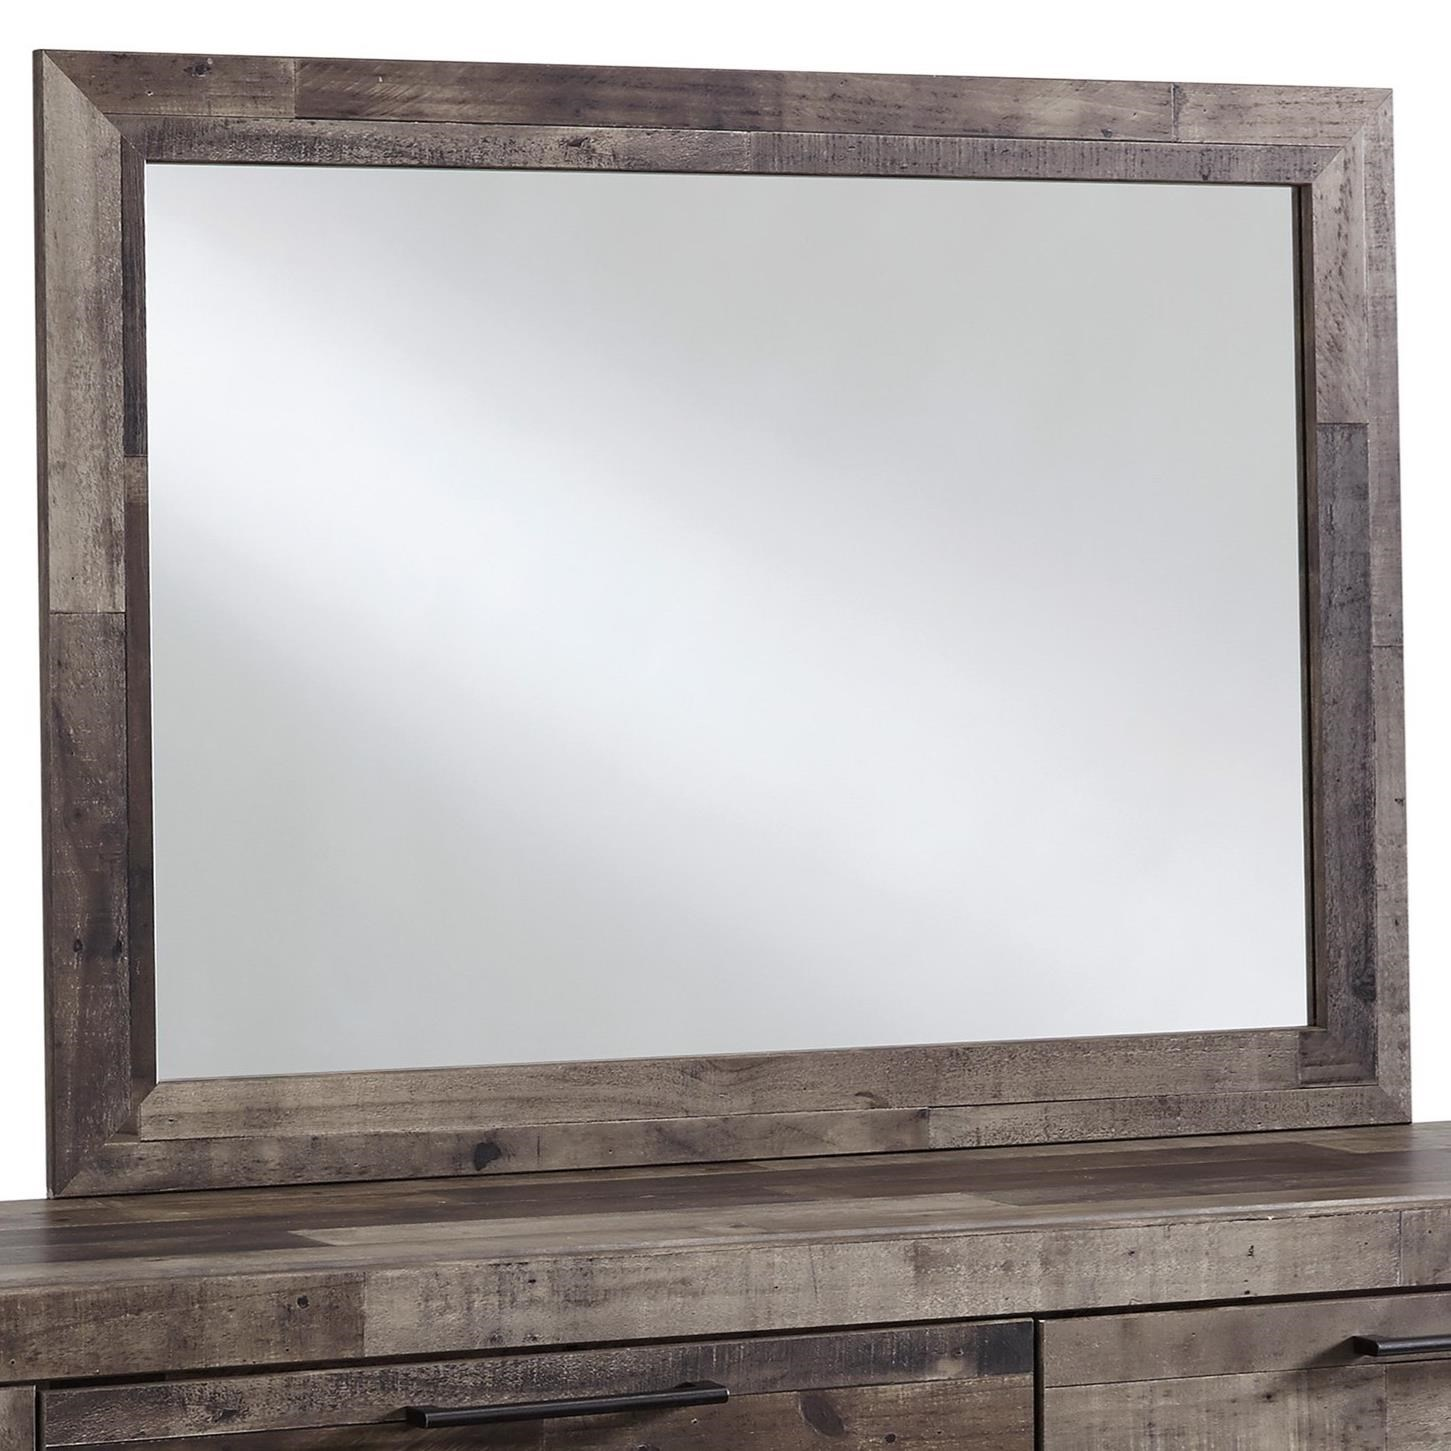 Benchcraft By Ashley Derekson Rustic Modern Bedroom Mirror Royal Furniture Dresser Mirrors